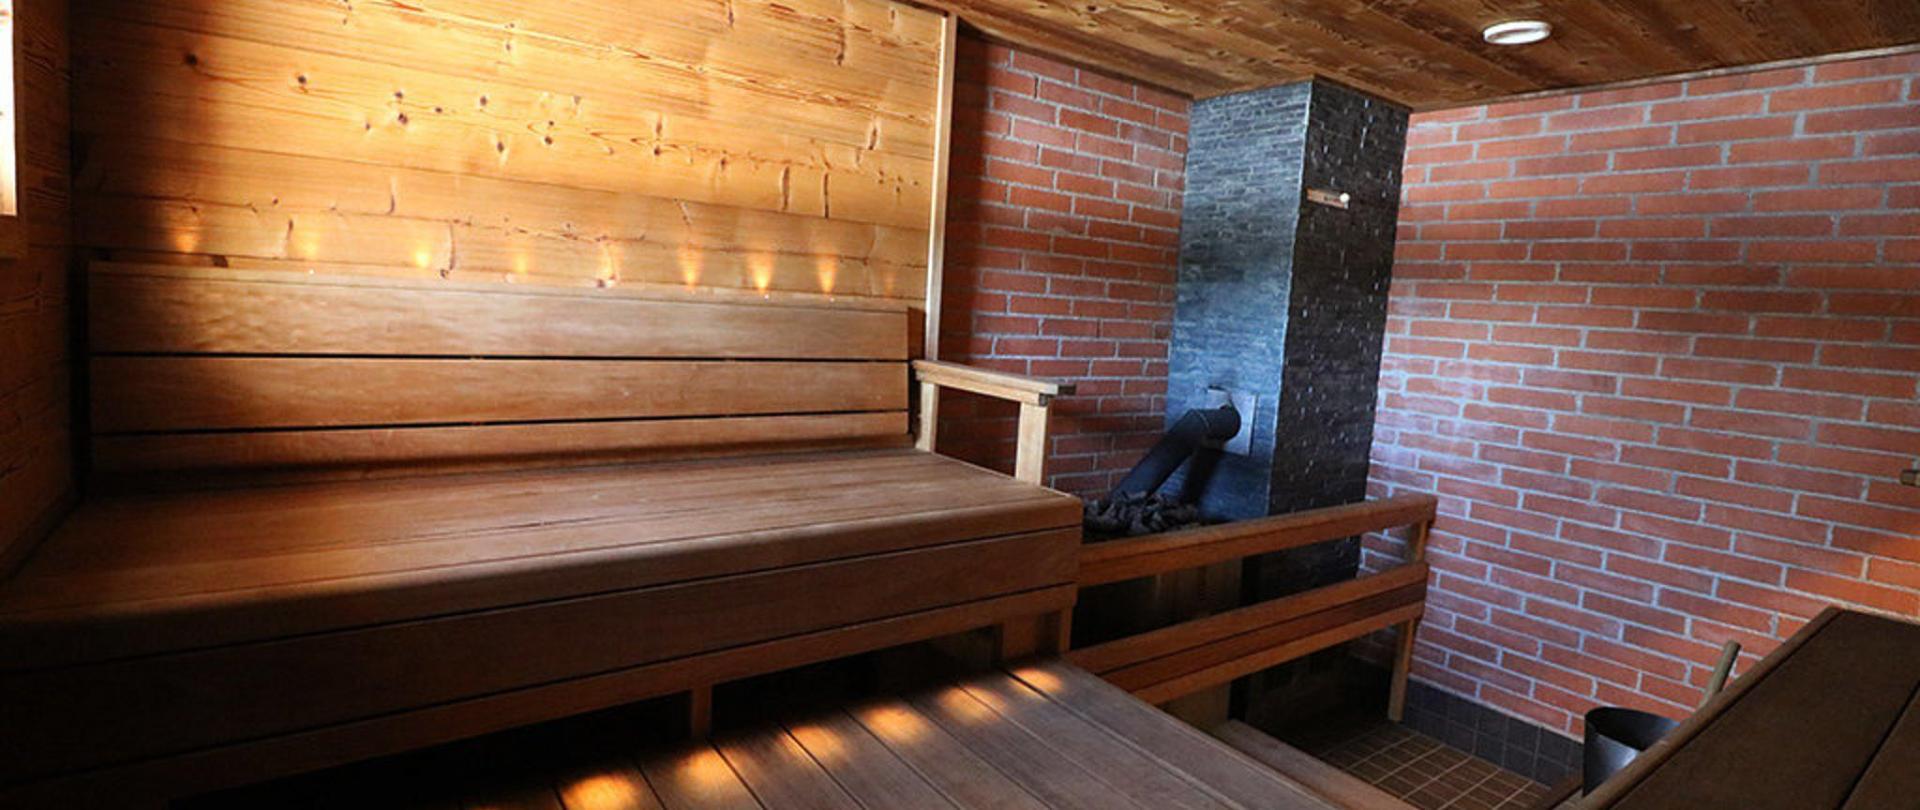 Sauna van binnen 2.jpg